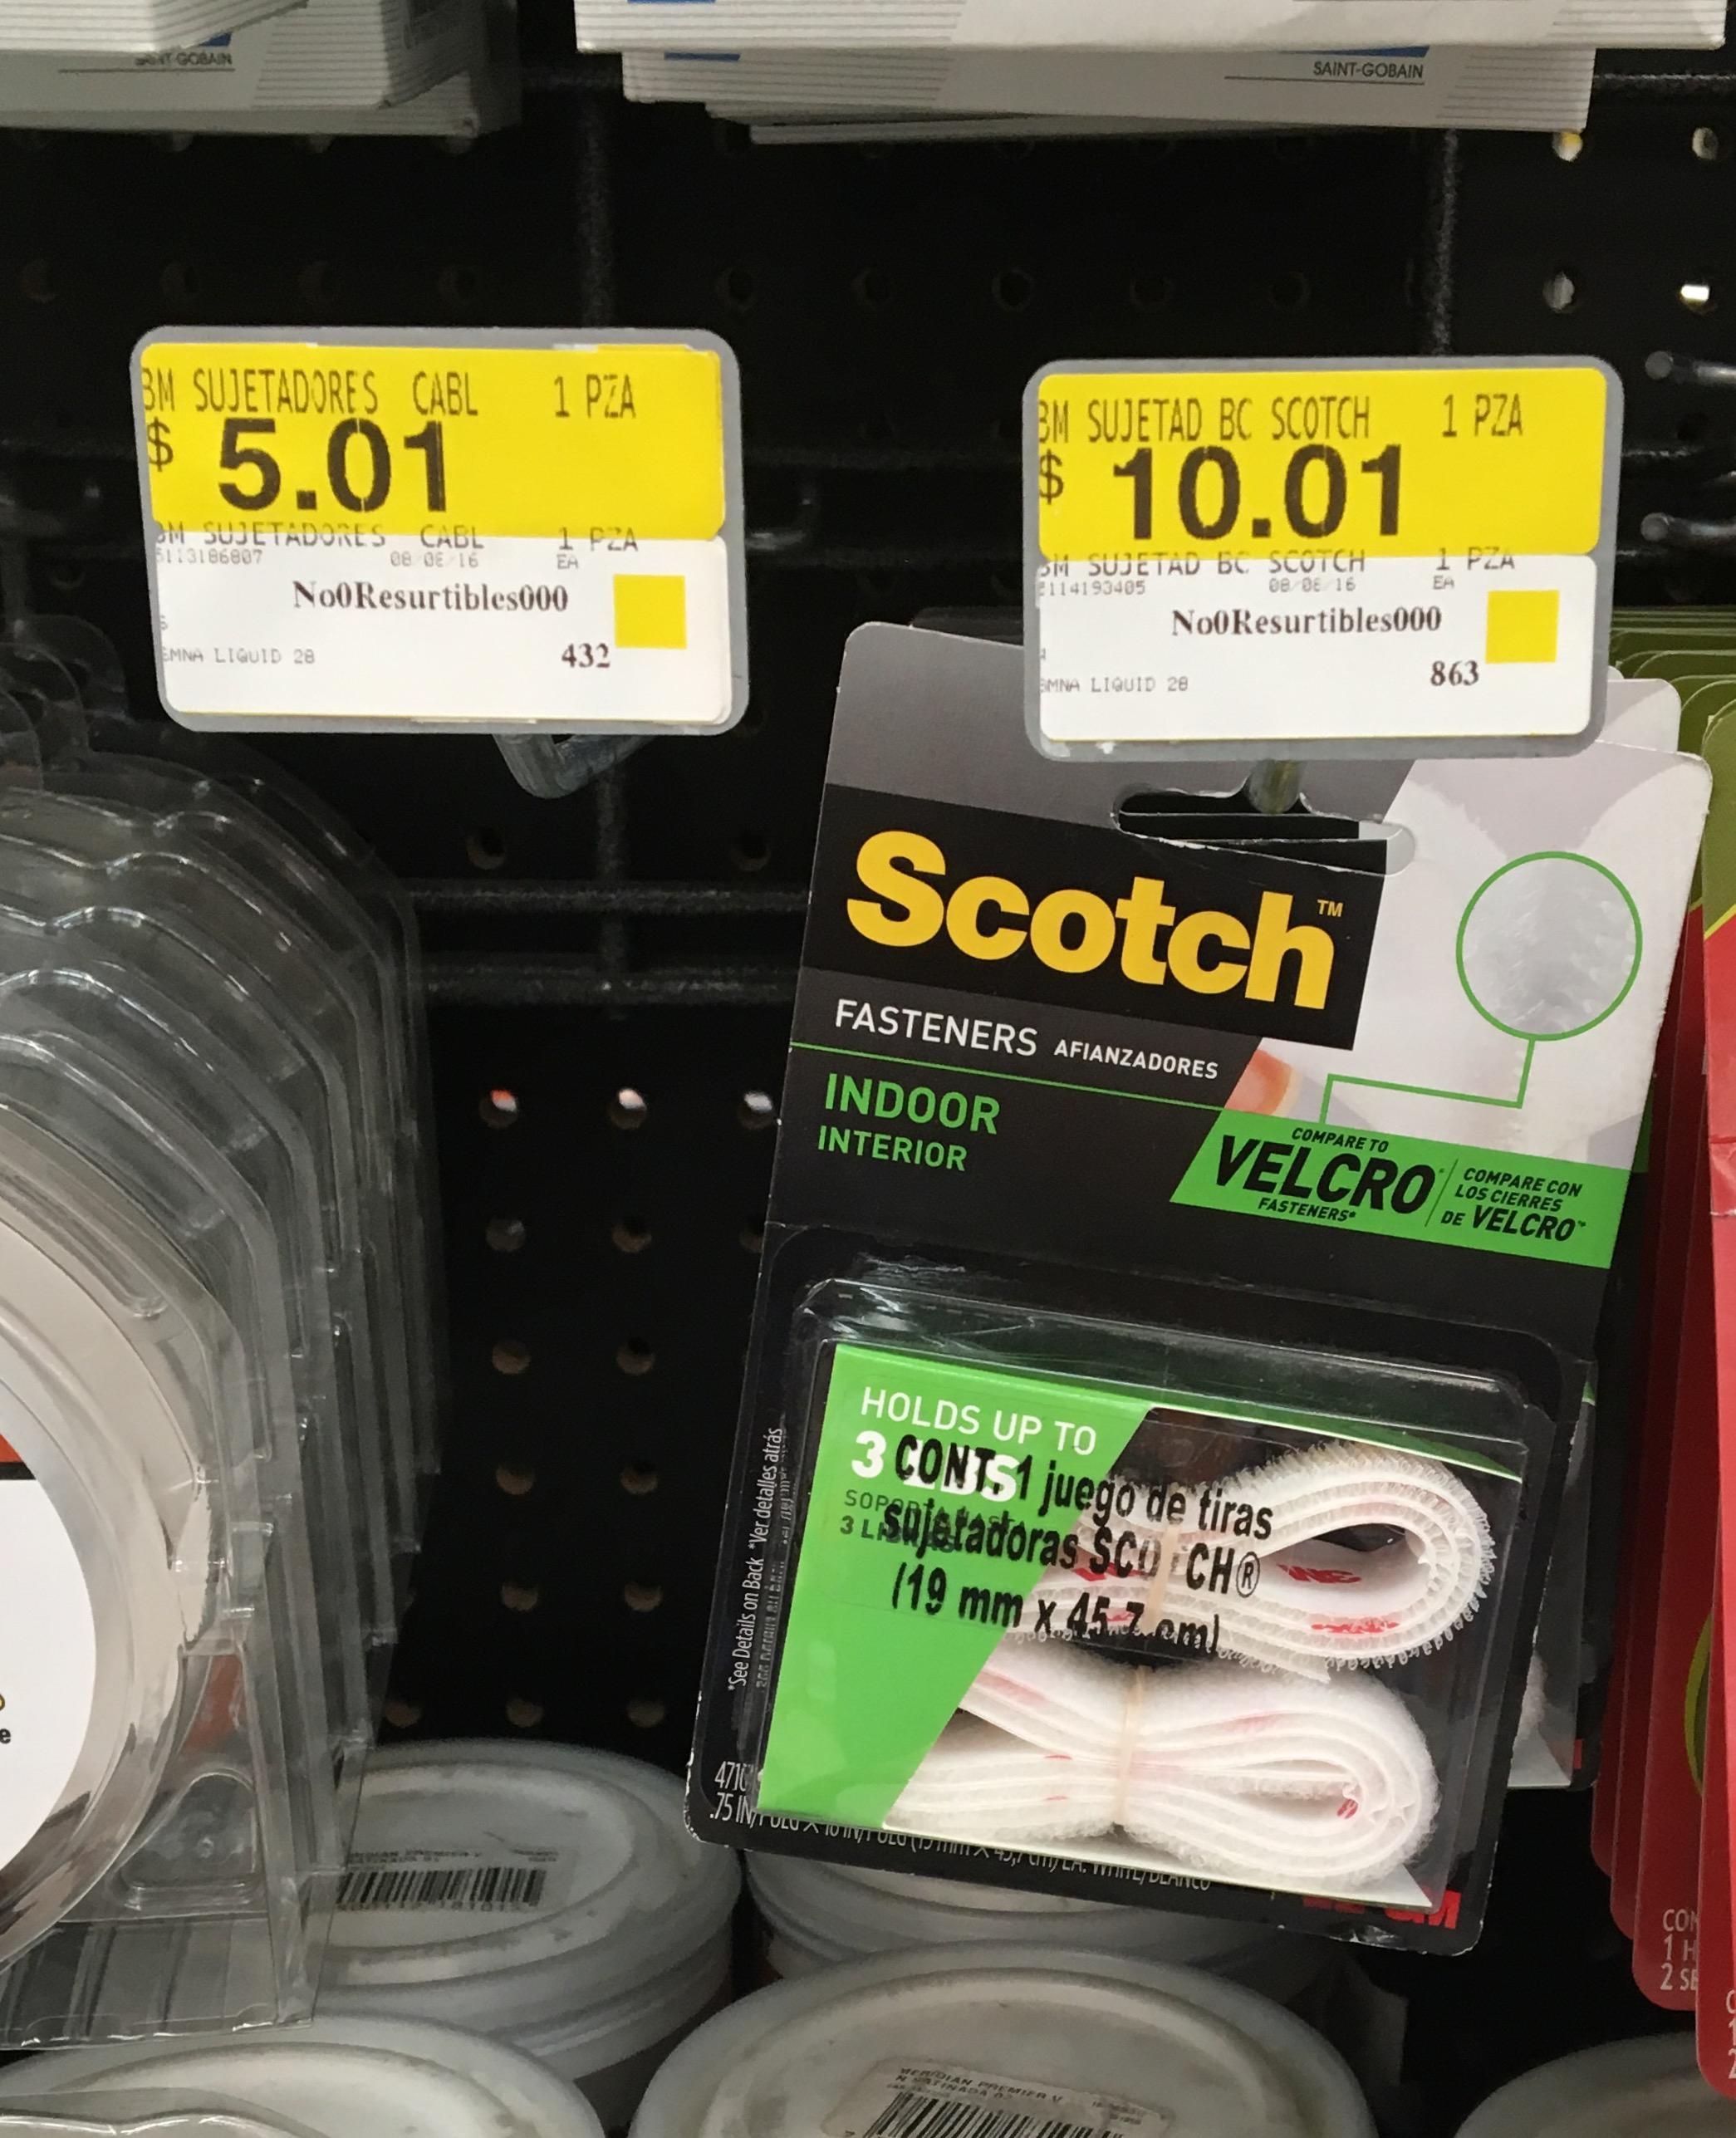 Walmart Perisur (CDMX): juego de tiras sujetadoras de velcro marca Scotch a $10.01